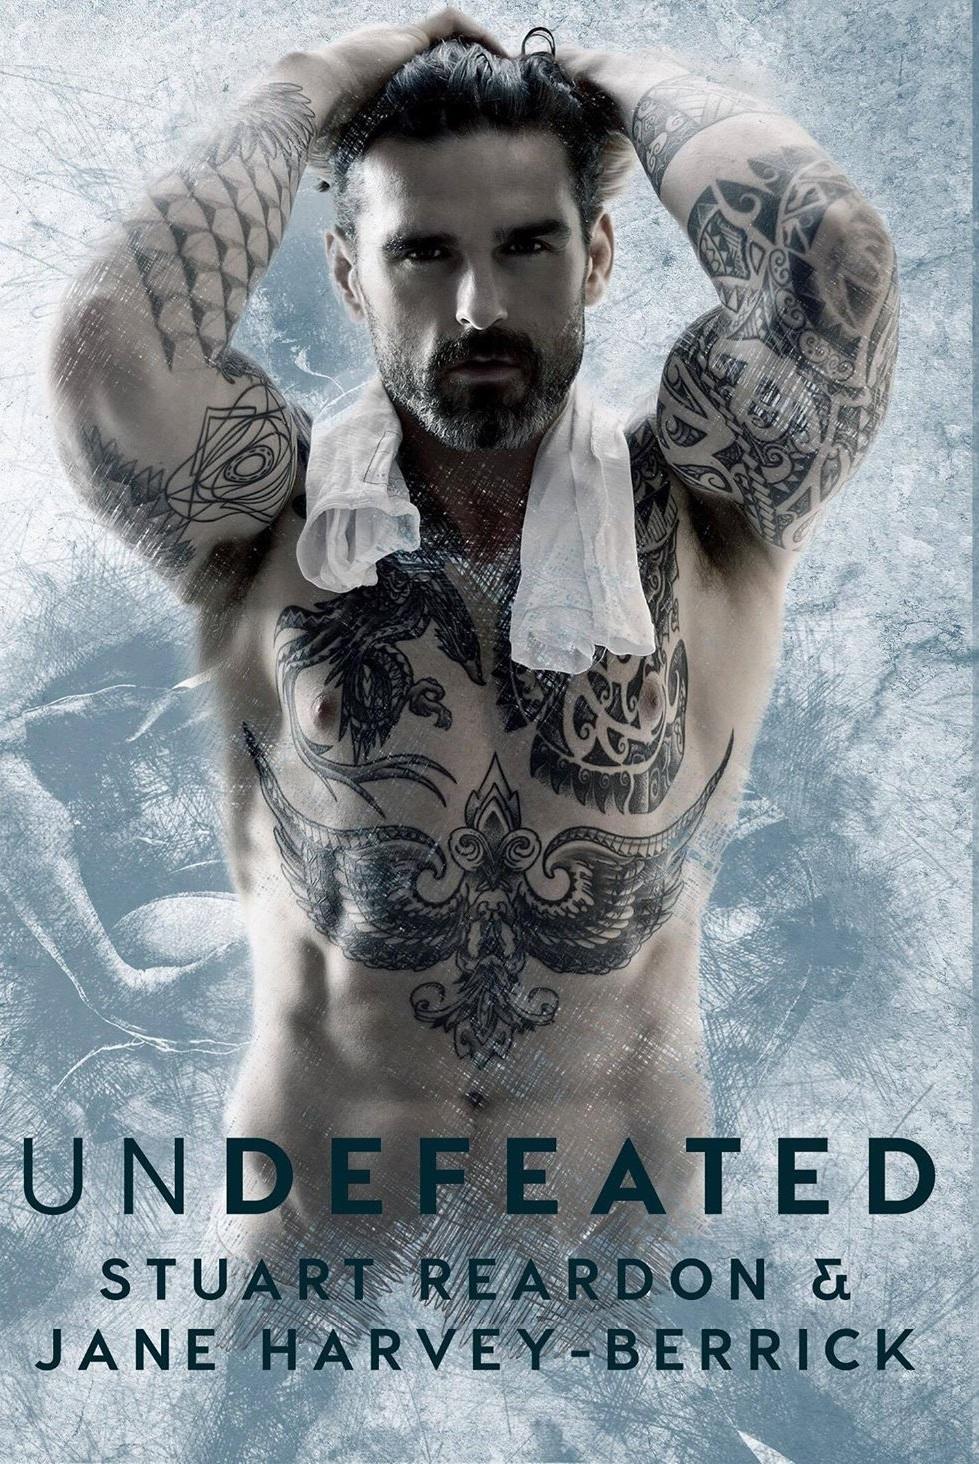 Undefeated by Stuart Reardon and Jane Harvey-Berrick